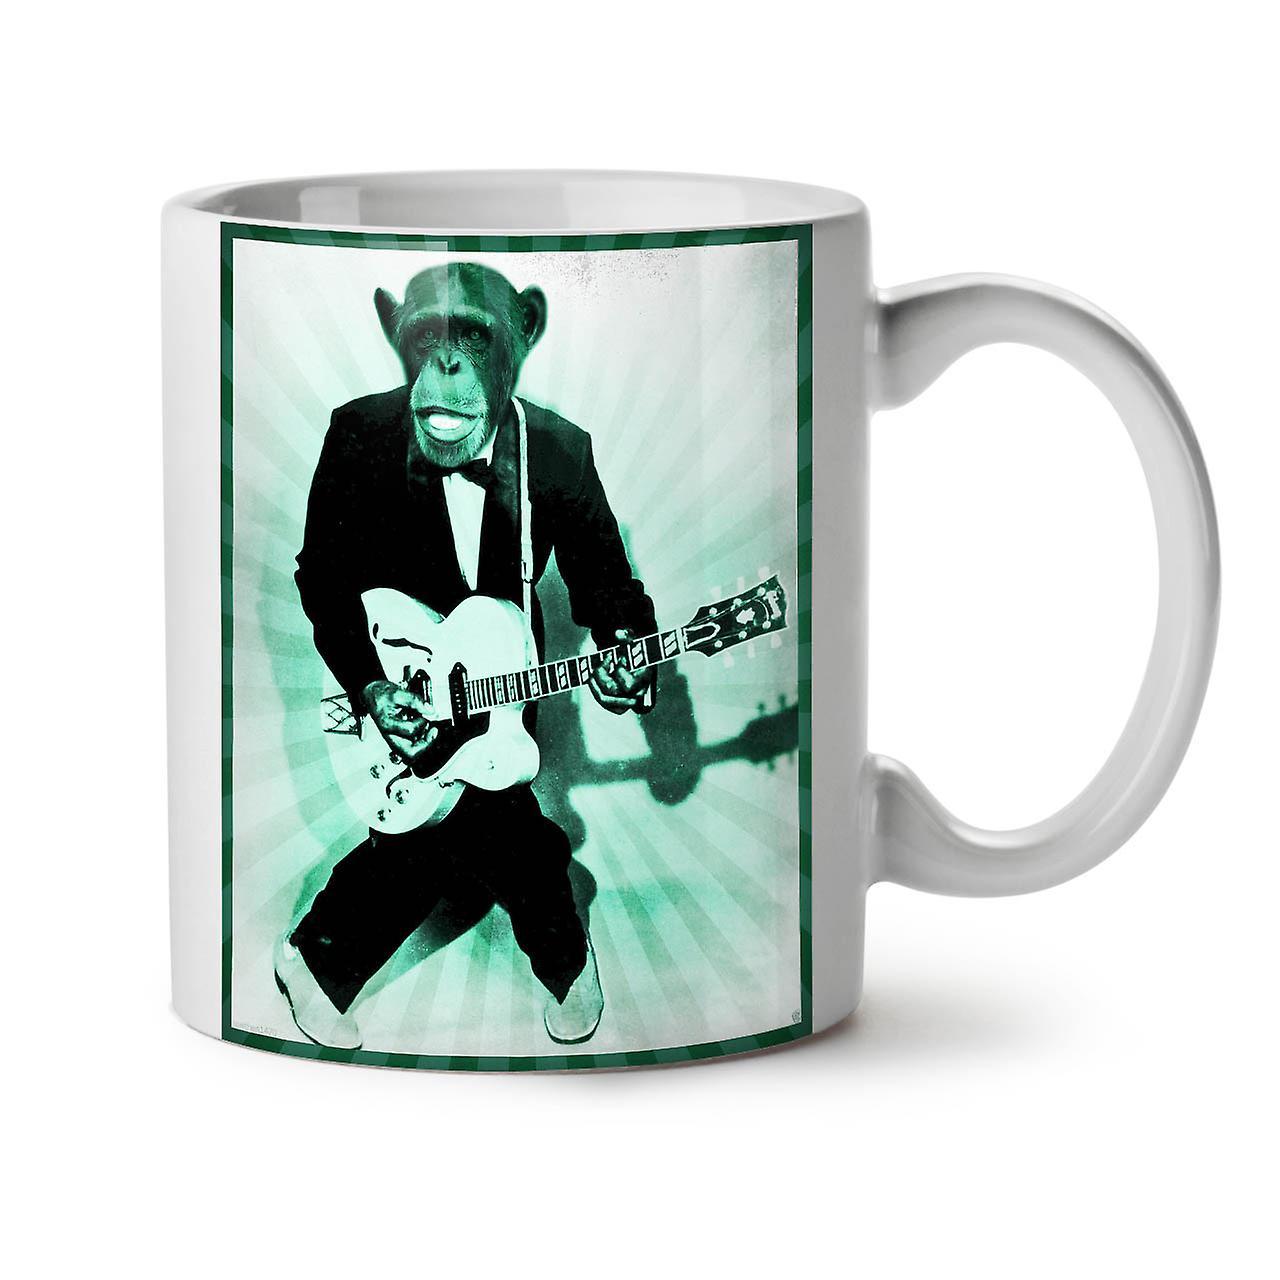 Thé Pour Café 11 Guitare Tasse Mokey OzWellcoda Nouveau Céramique Musique Blanc lKJ1cF